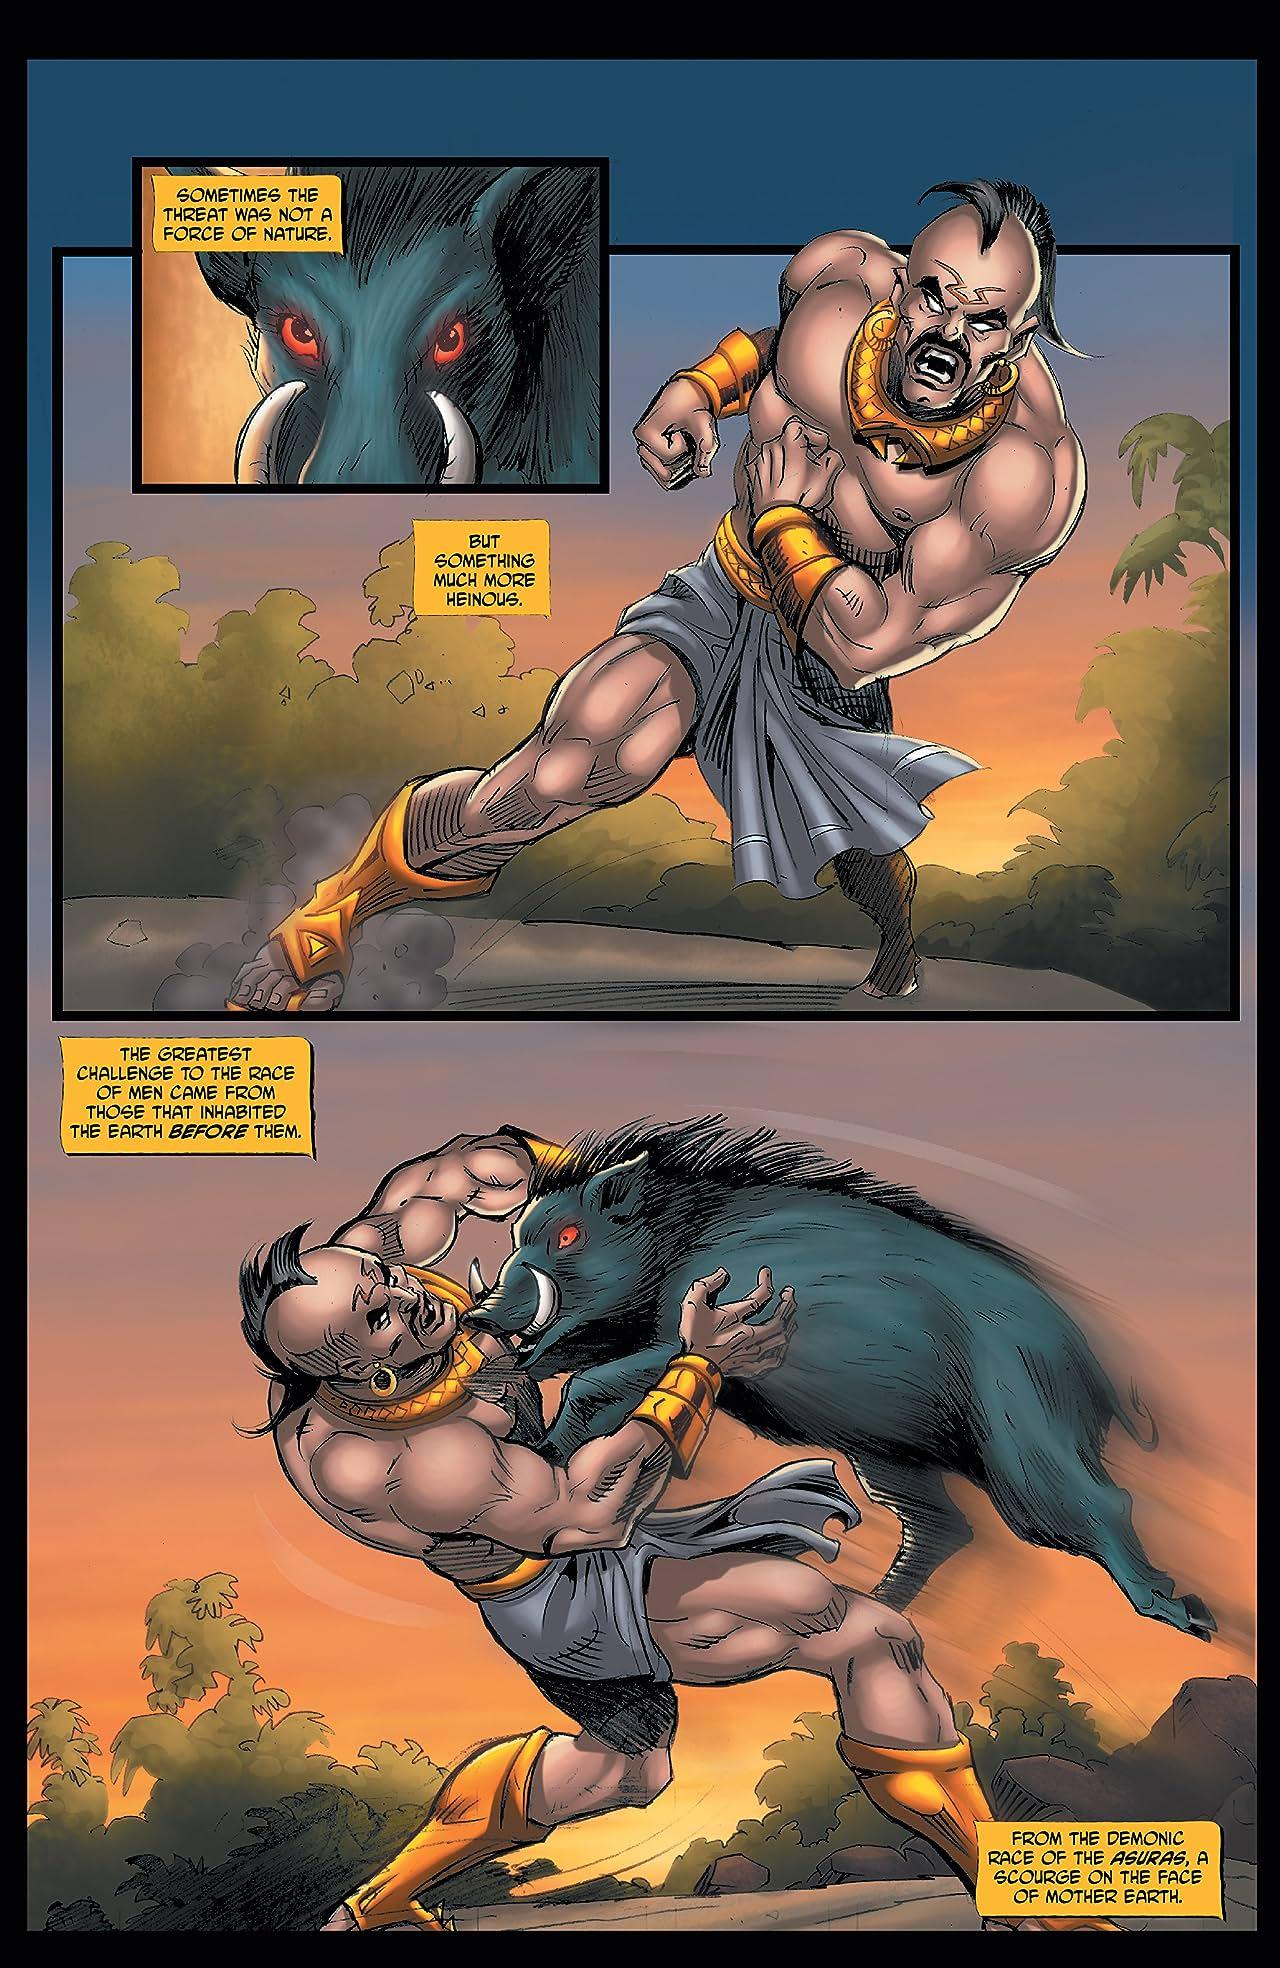 Myths of India: Vishnu